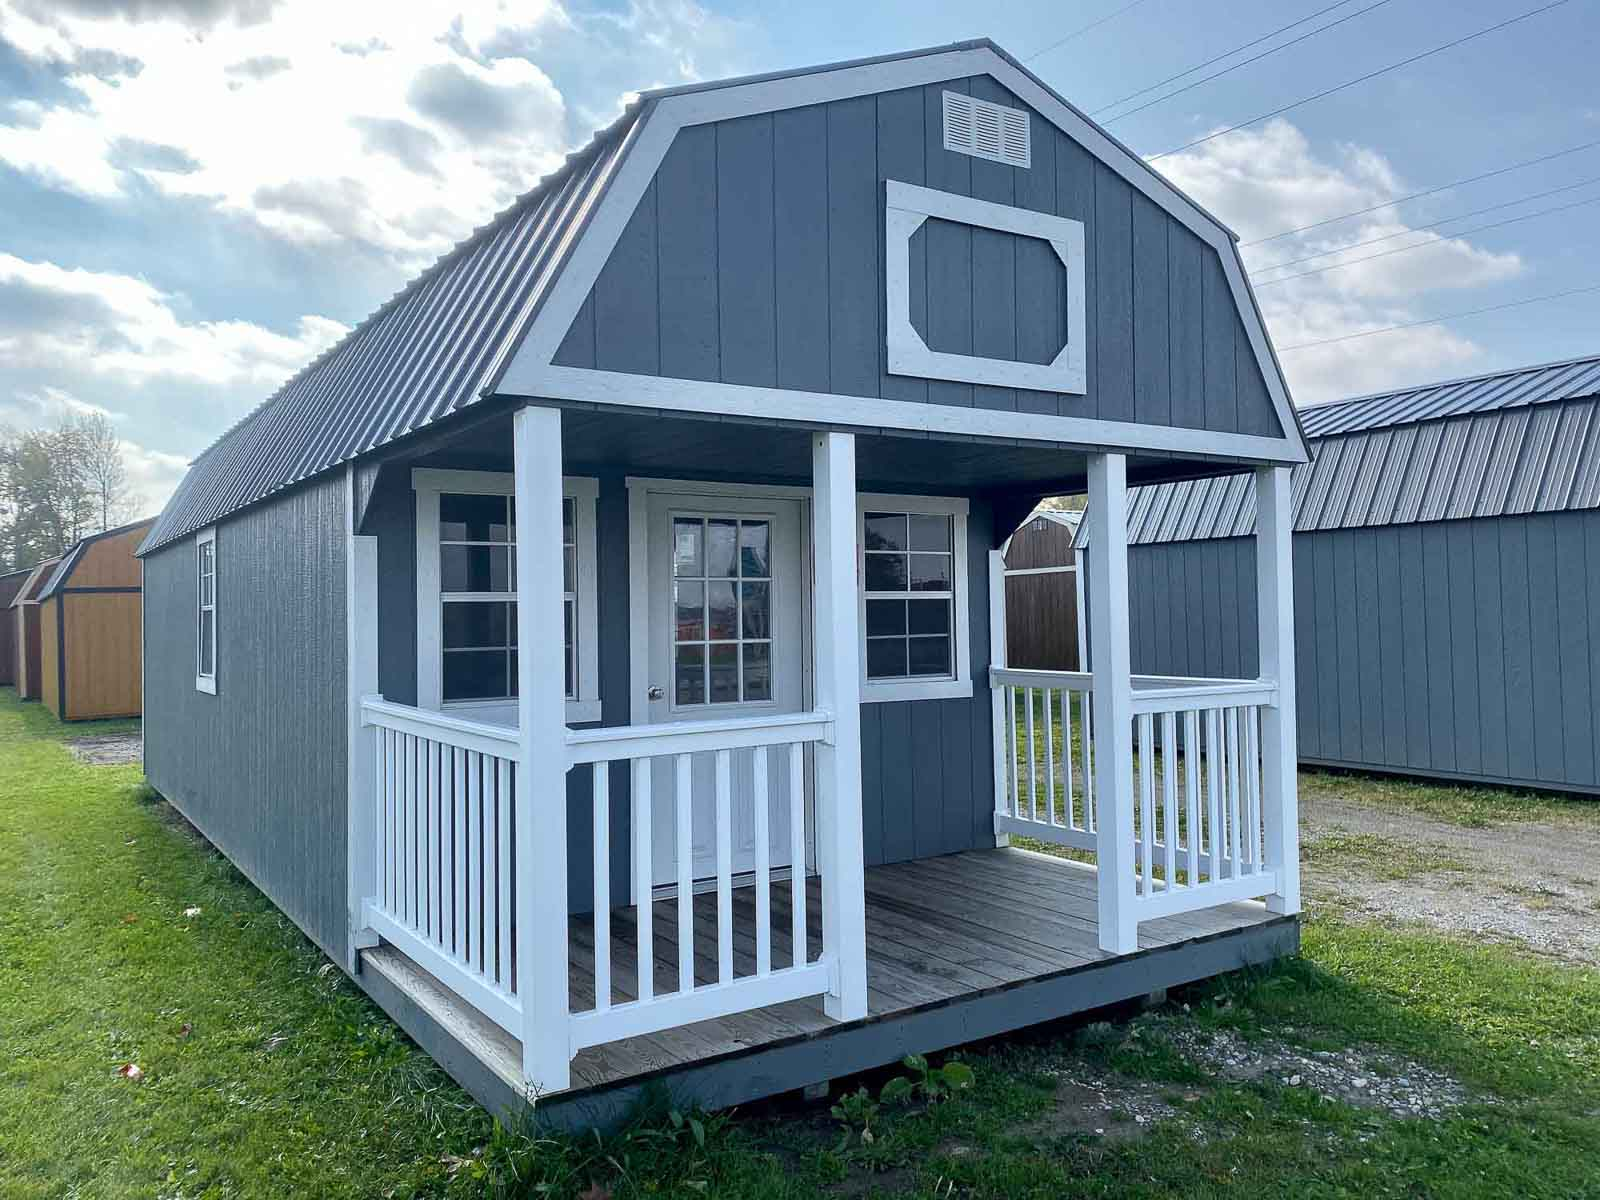 Amish Cabins located in Adrian Michigan